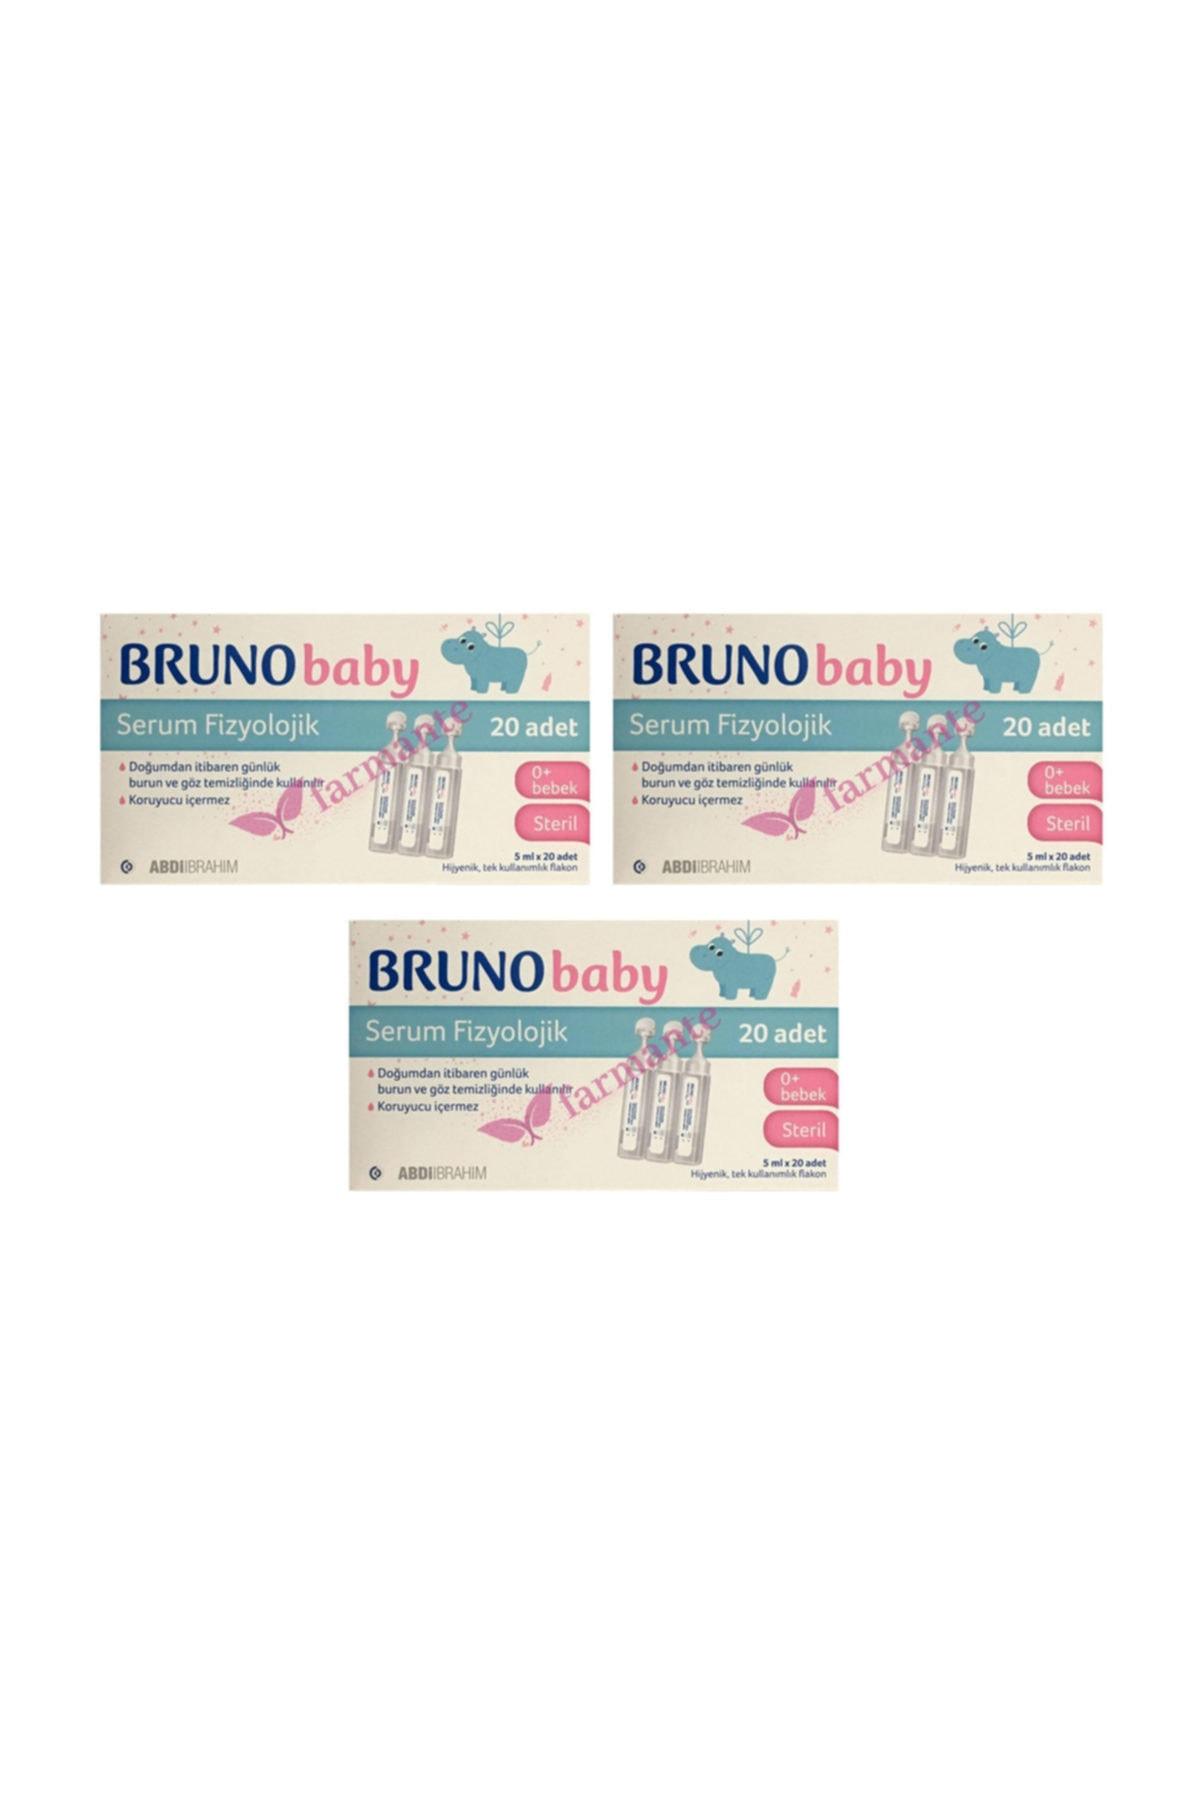 Bruno Baby Serum Fizyolojik Damla 3 Paket 5 Ml X 20 Adet 1